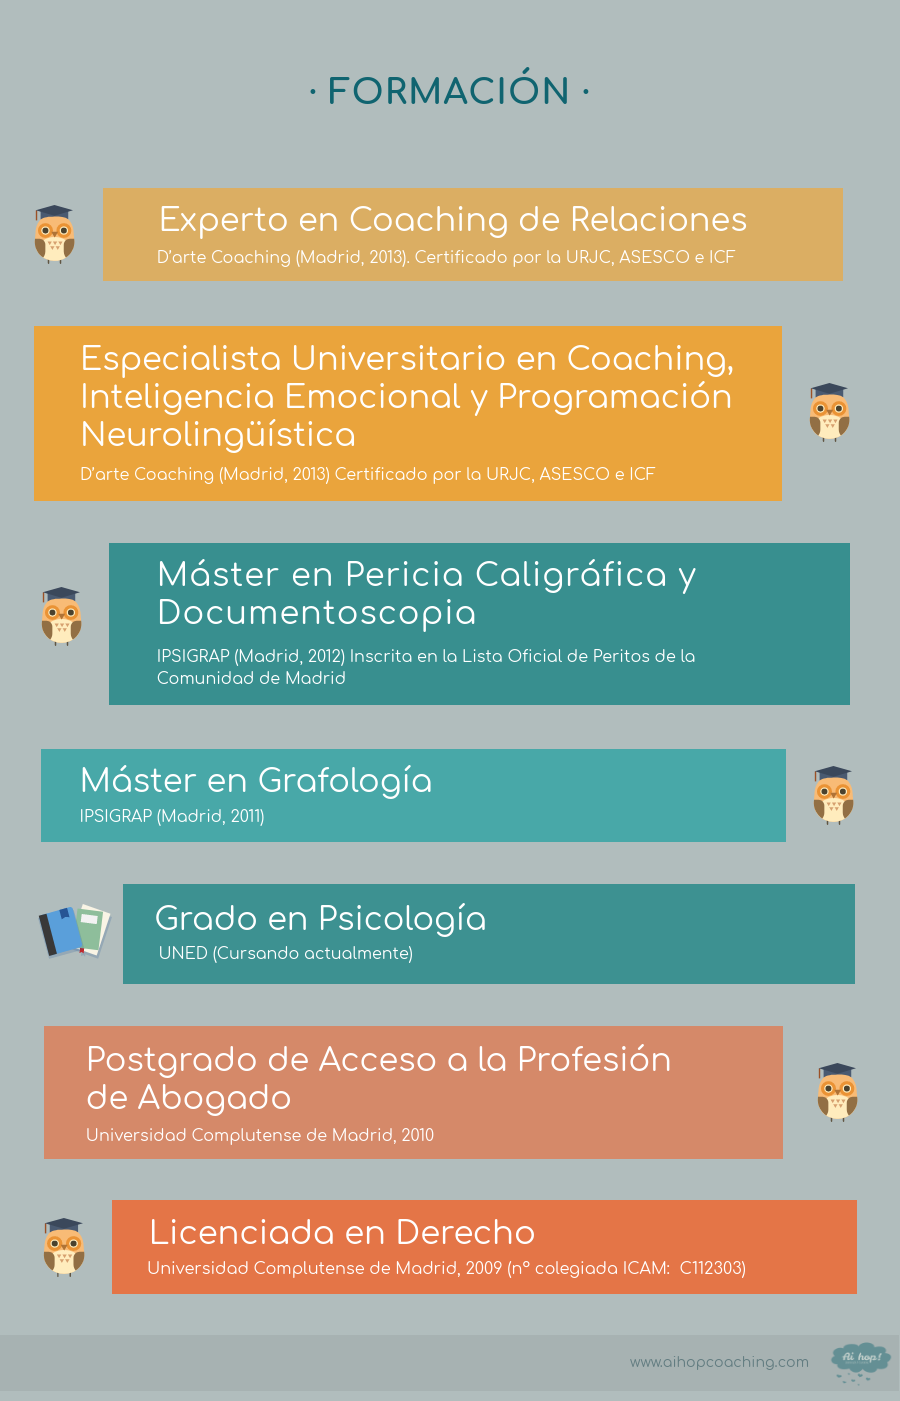 formacion-ainoa-espejo-aihop-coaching-grafologia